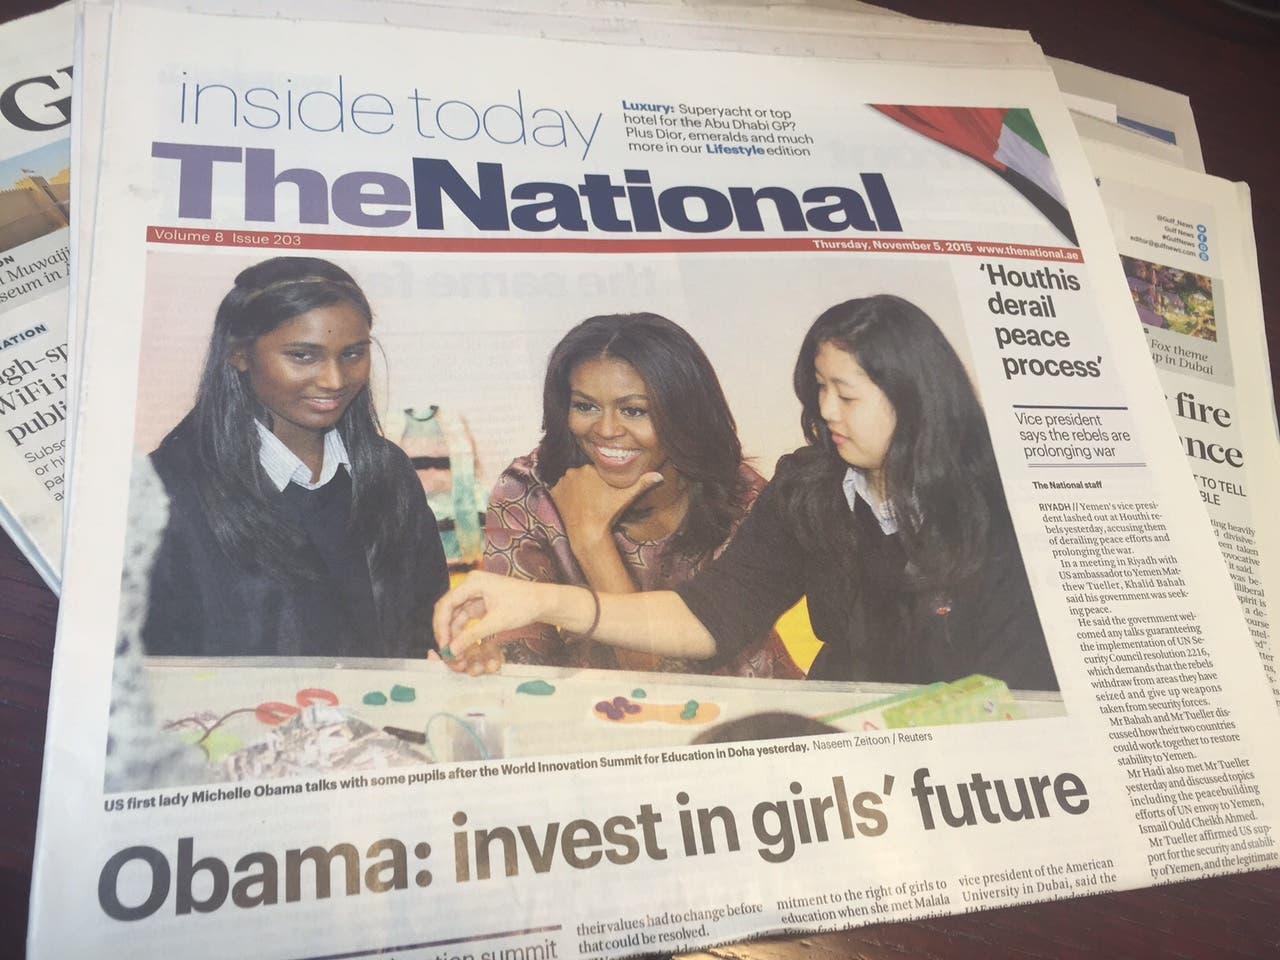 First Lady Michelle Obama won praise by local Arab media praise, not so much from back home. (Al Arabiya)